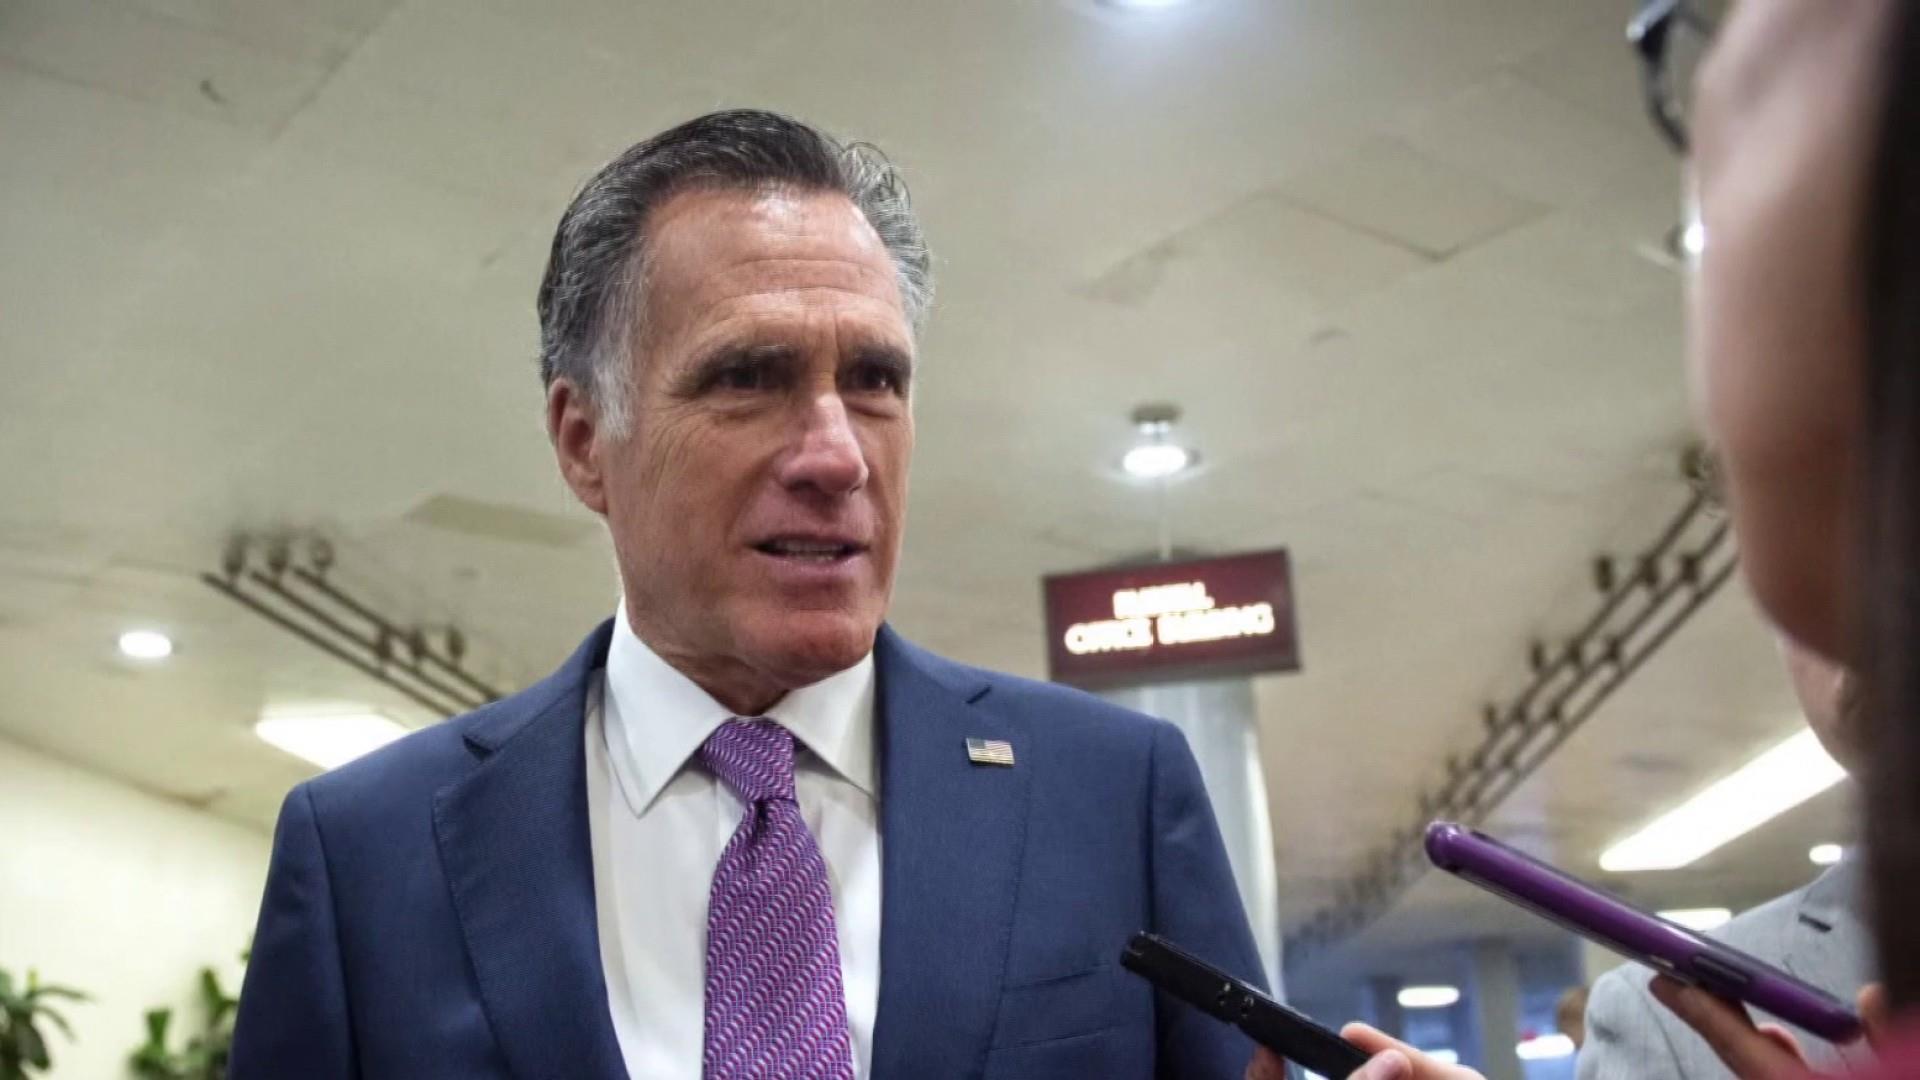 Republican Senator Mitt Romney won't endorse President Trump for re-election